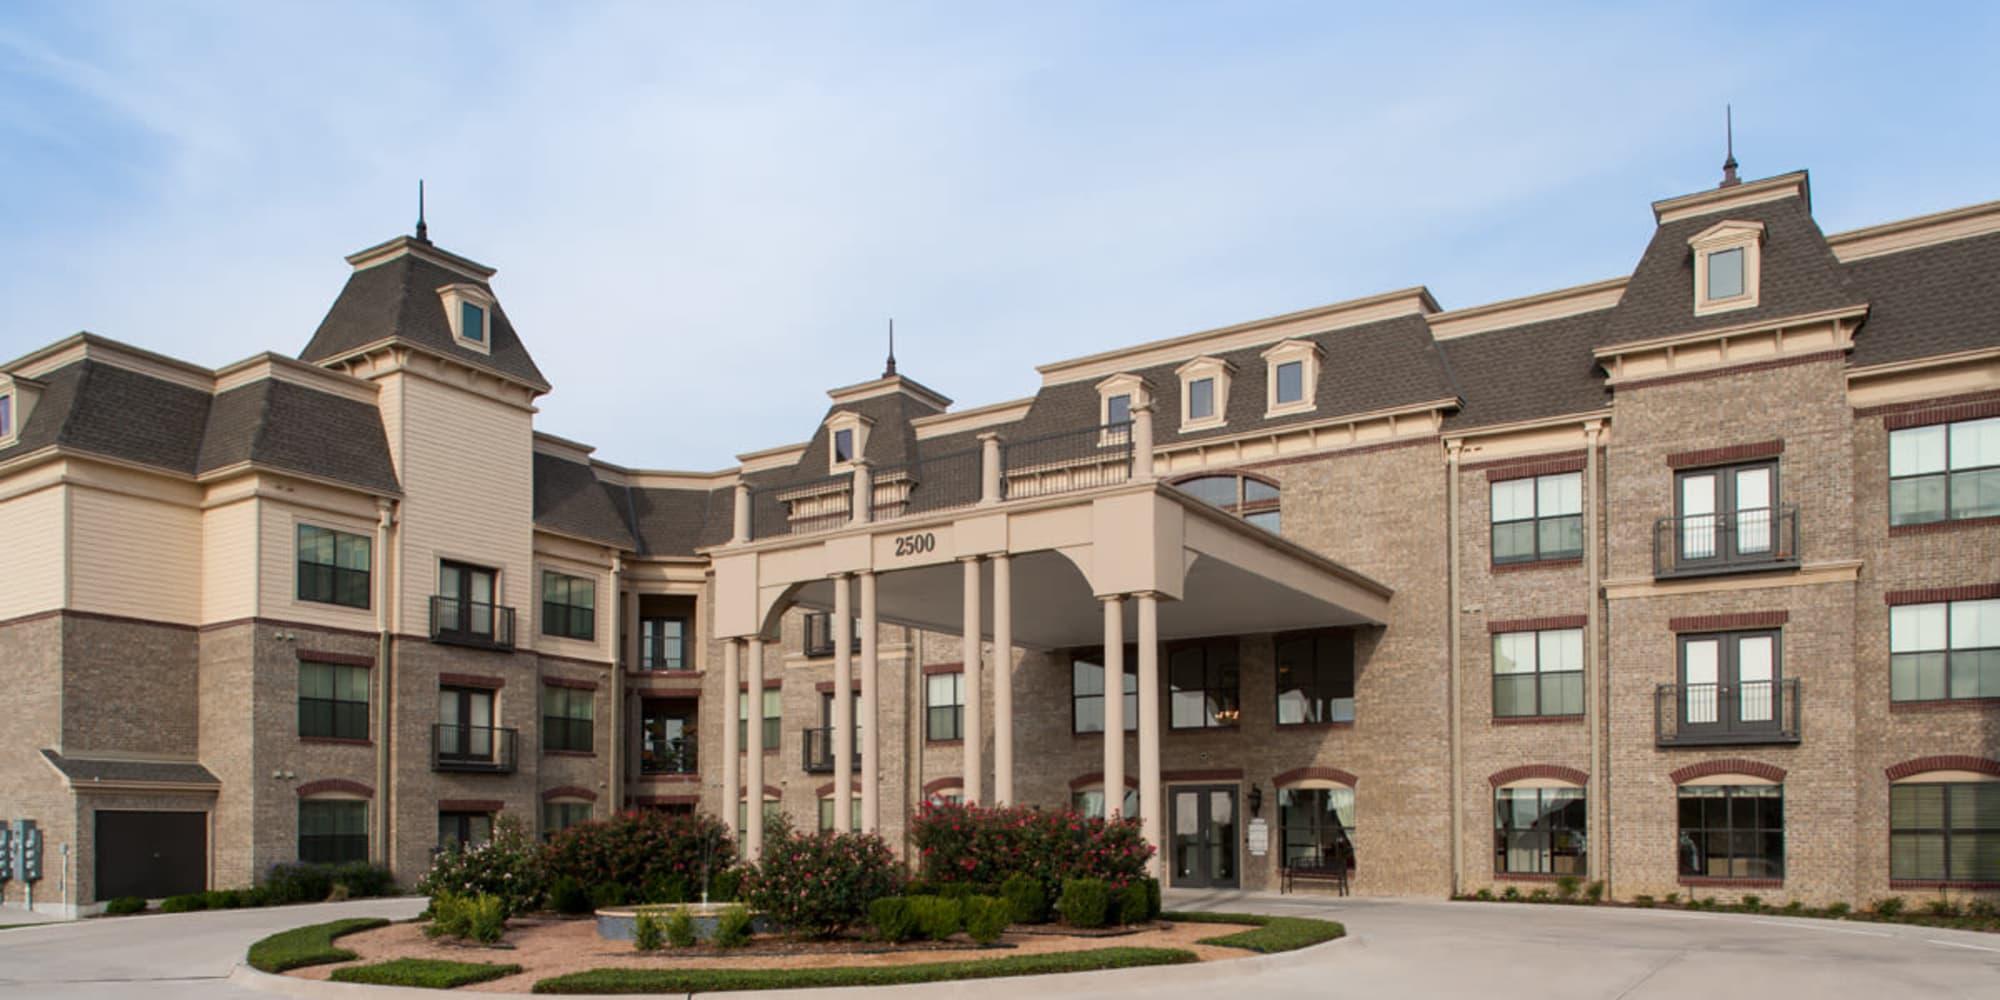 Lewisville senior living community with wonderful amenities